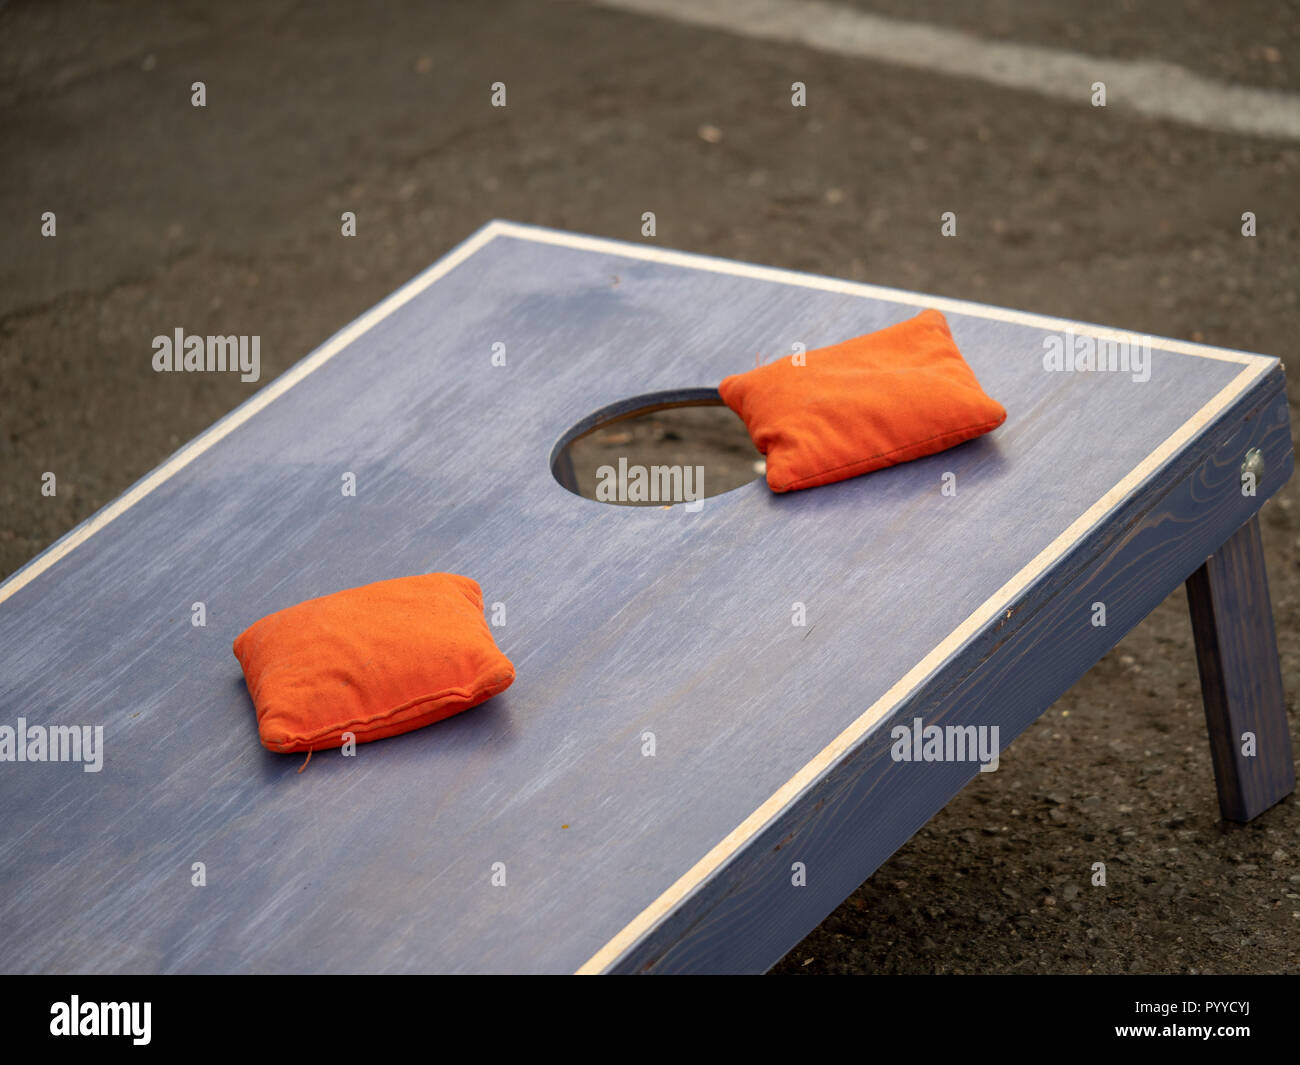 Orange beanbags sitting on blue cornhole board platform - Stock Image